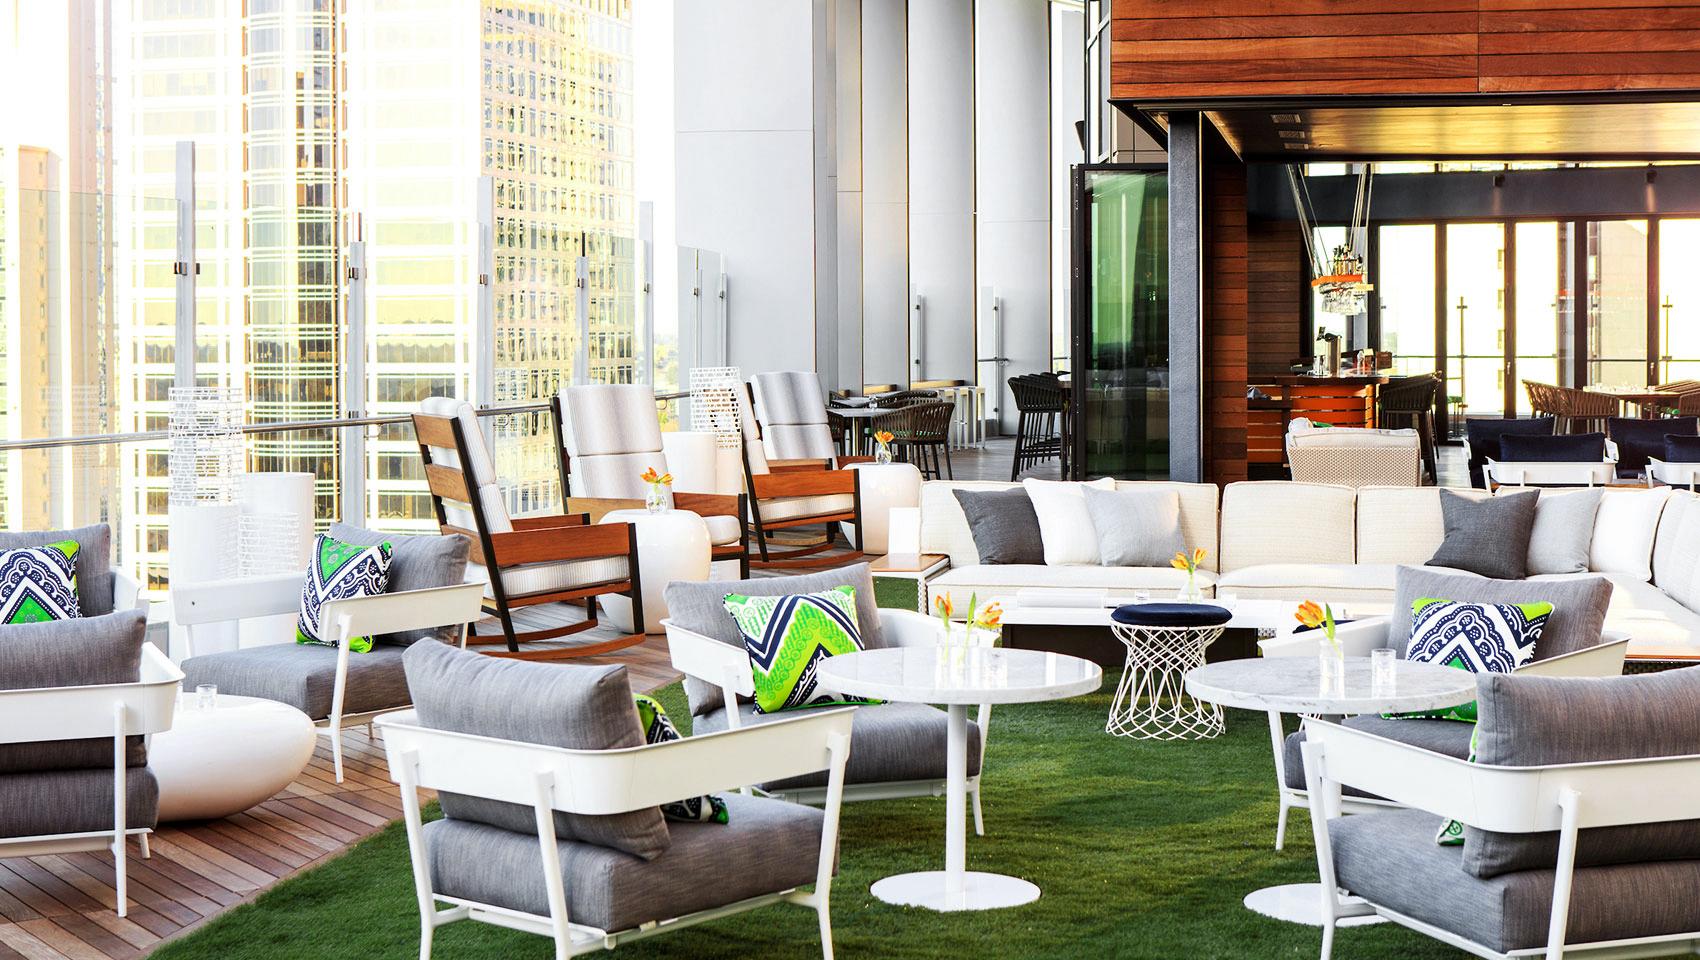 new venue indoor seating reception space